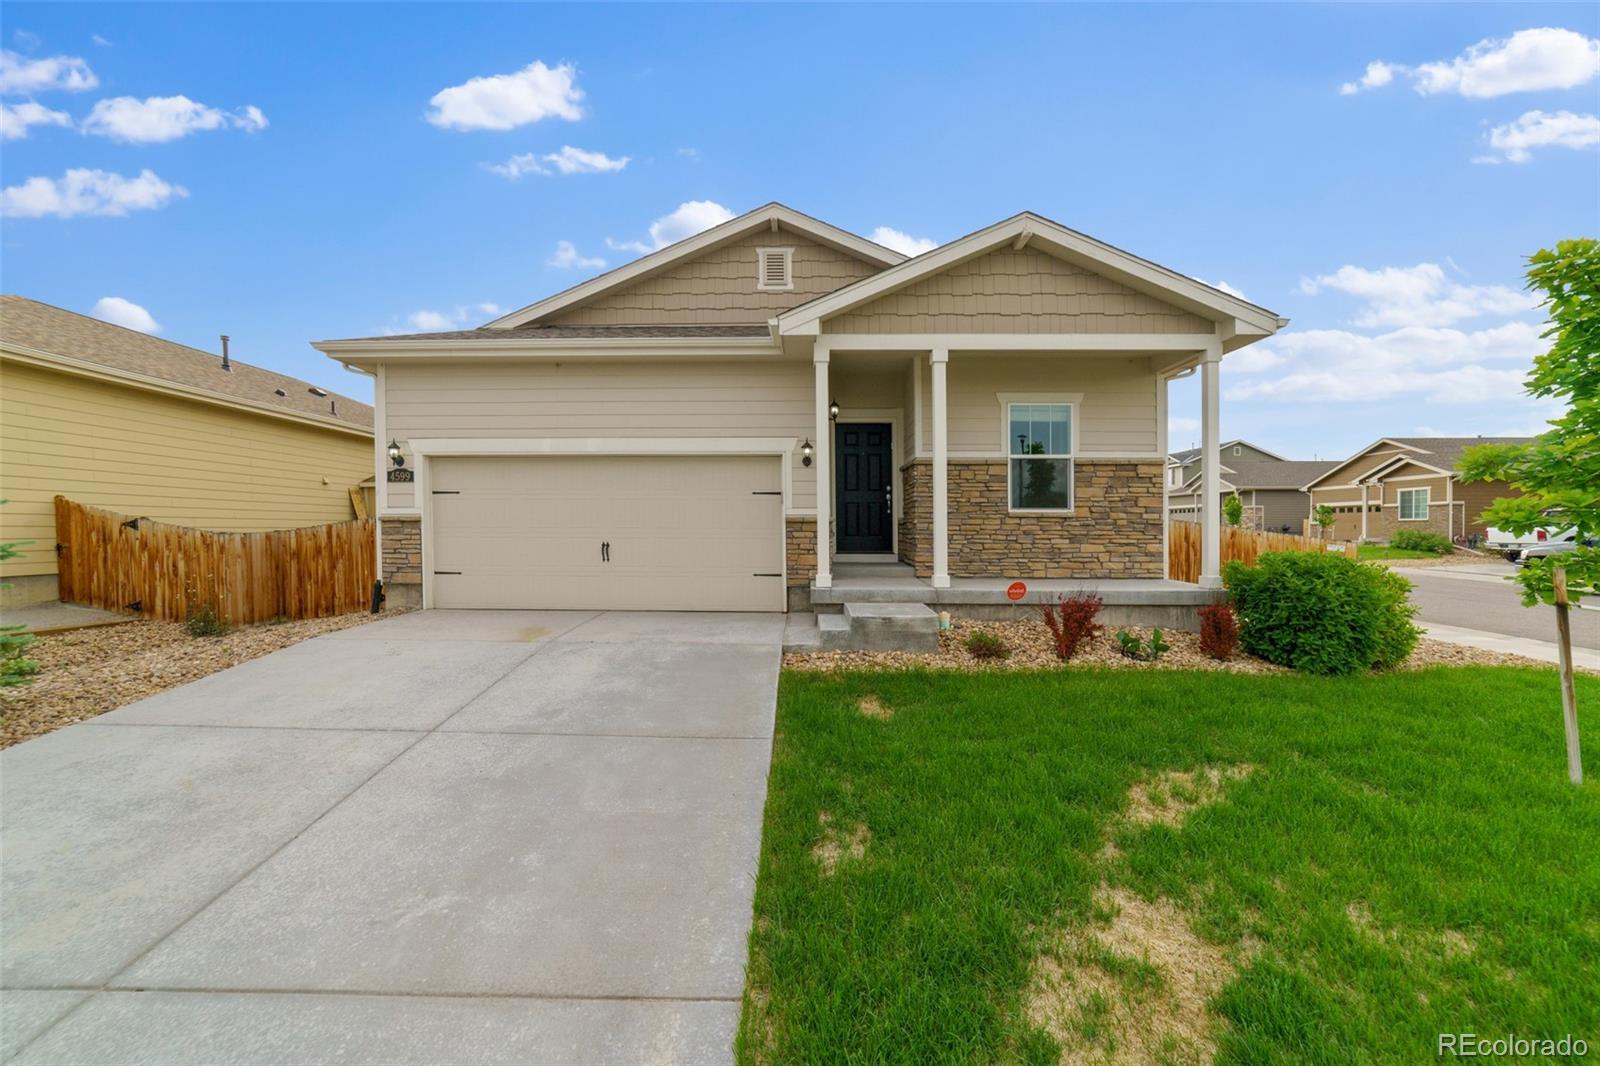 4599 E 95th Court Property Photo - Thornton, CO real estate listing